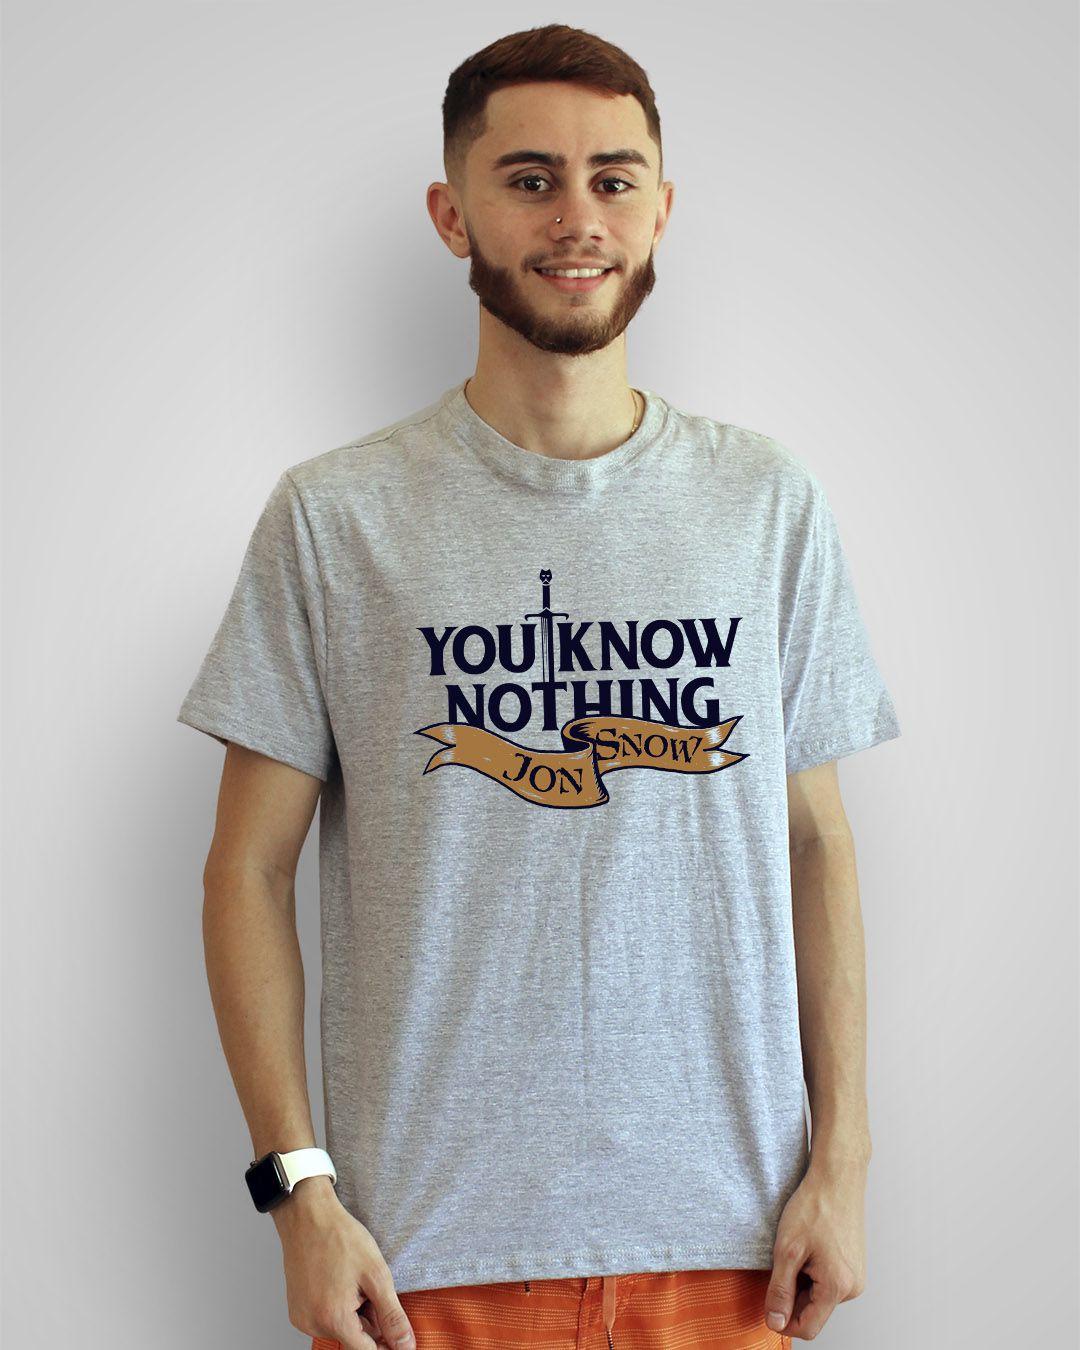 Camiseta You know nothing, Jon Snow - Game of Thrones